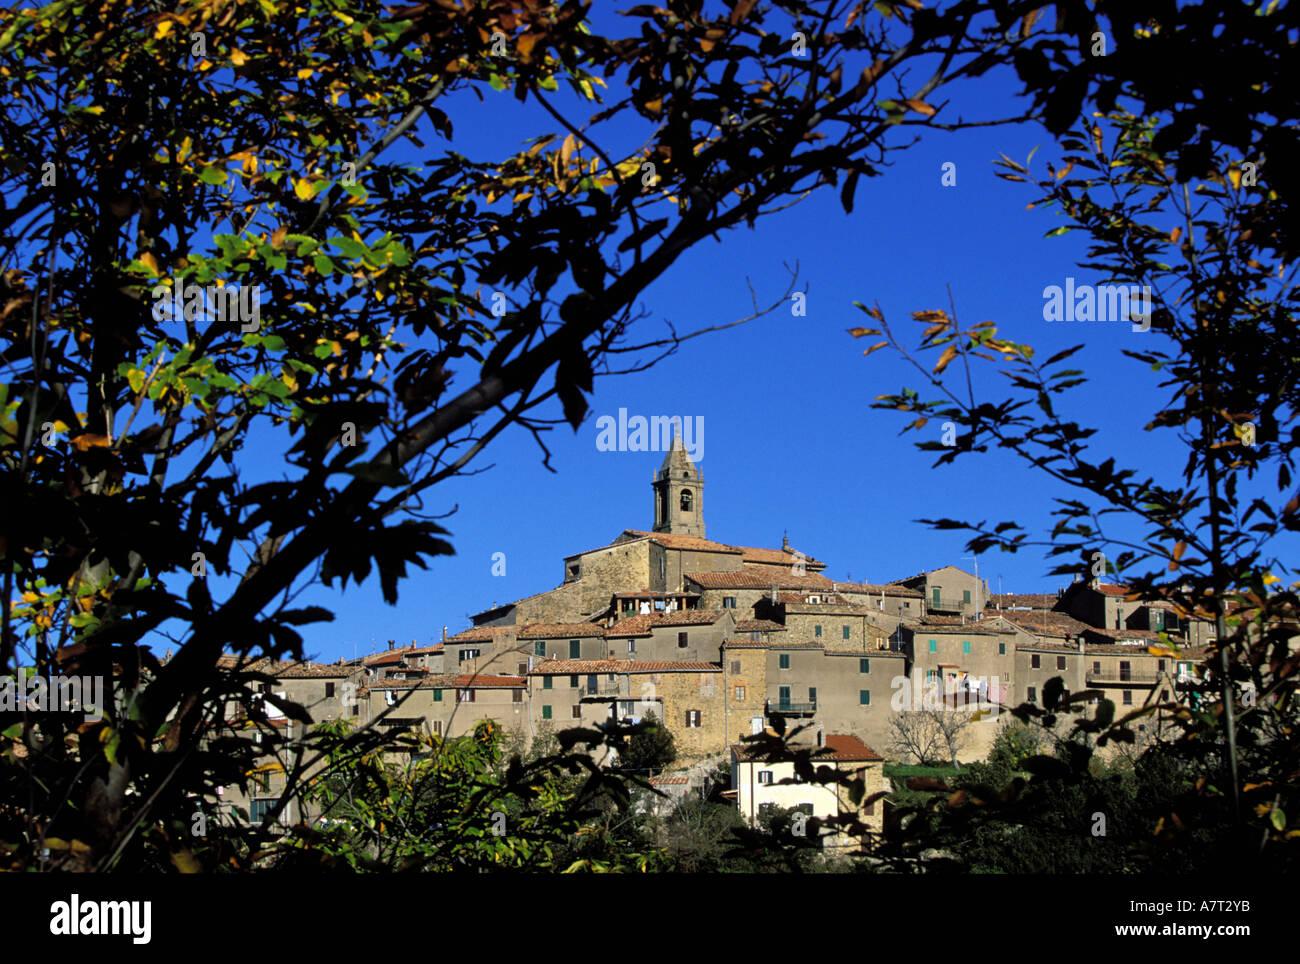 Italien, Toskana, Monticello Amiata in der Nähe von Monte Amiata Stockfoto